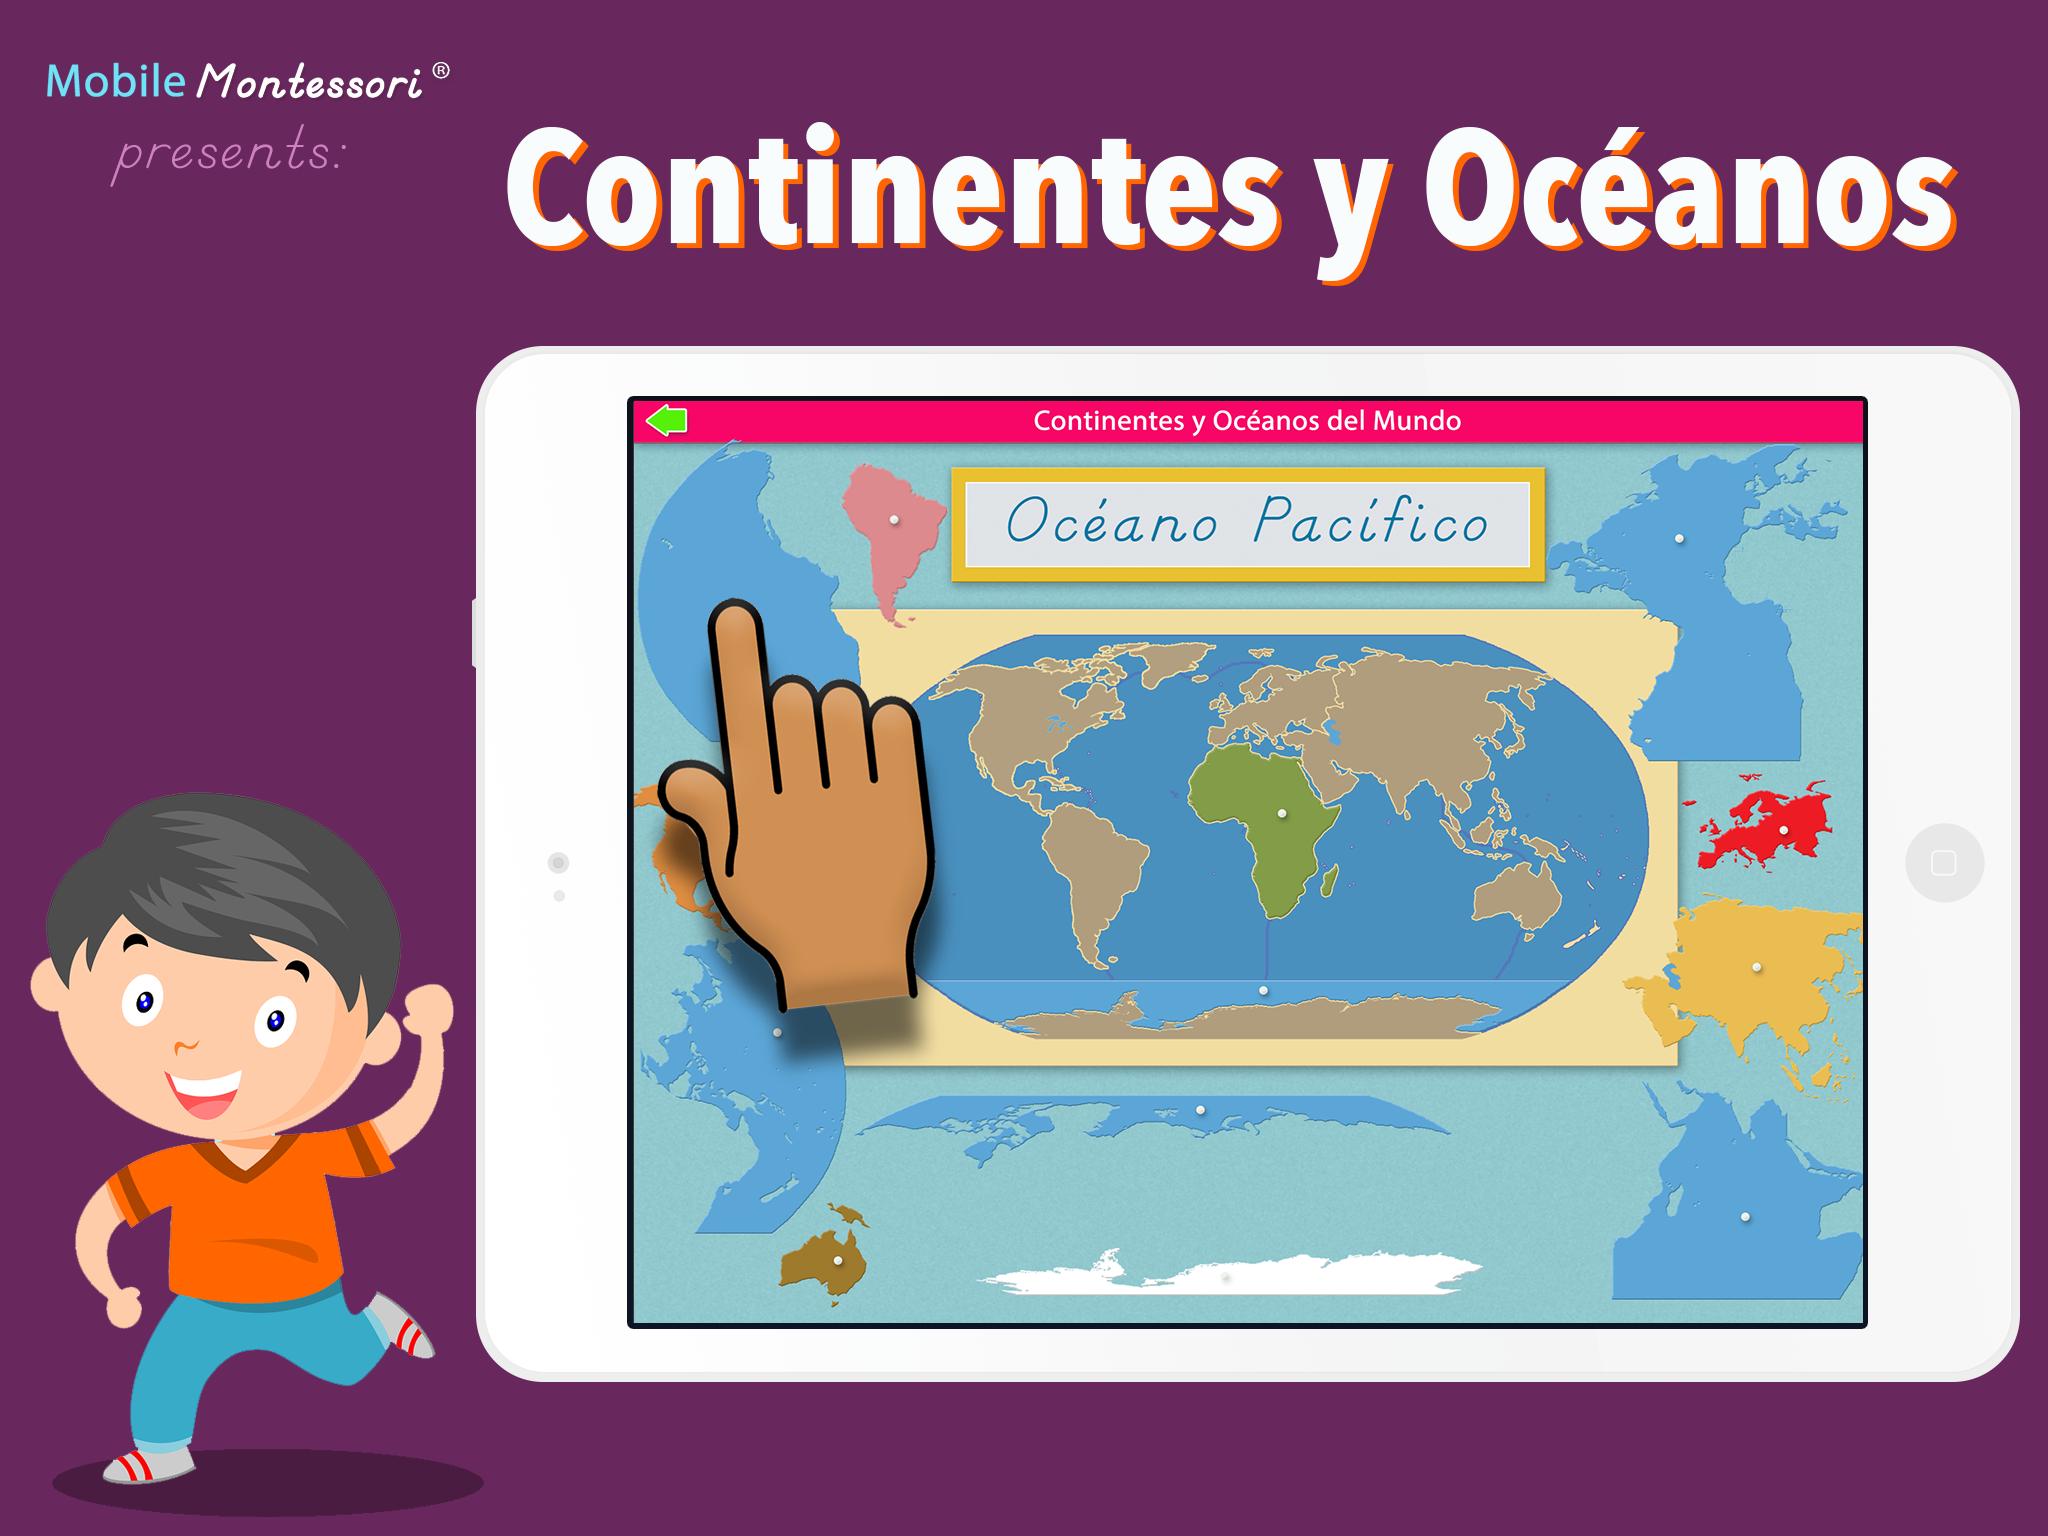 ContinentsSpanishiPadSC1-reg.png